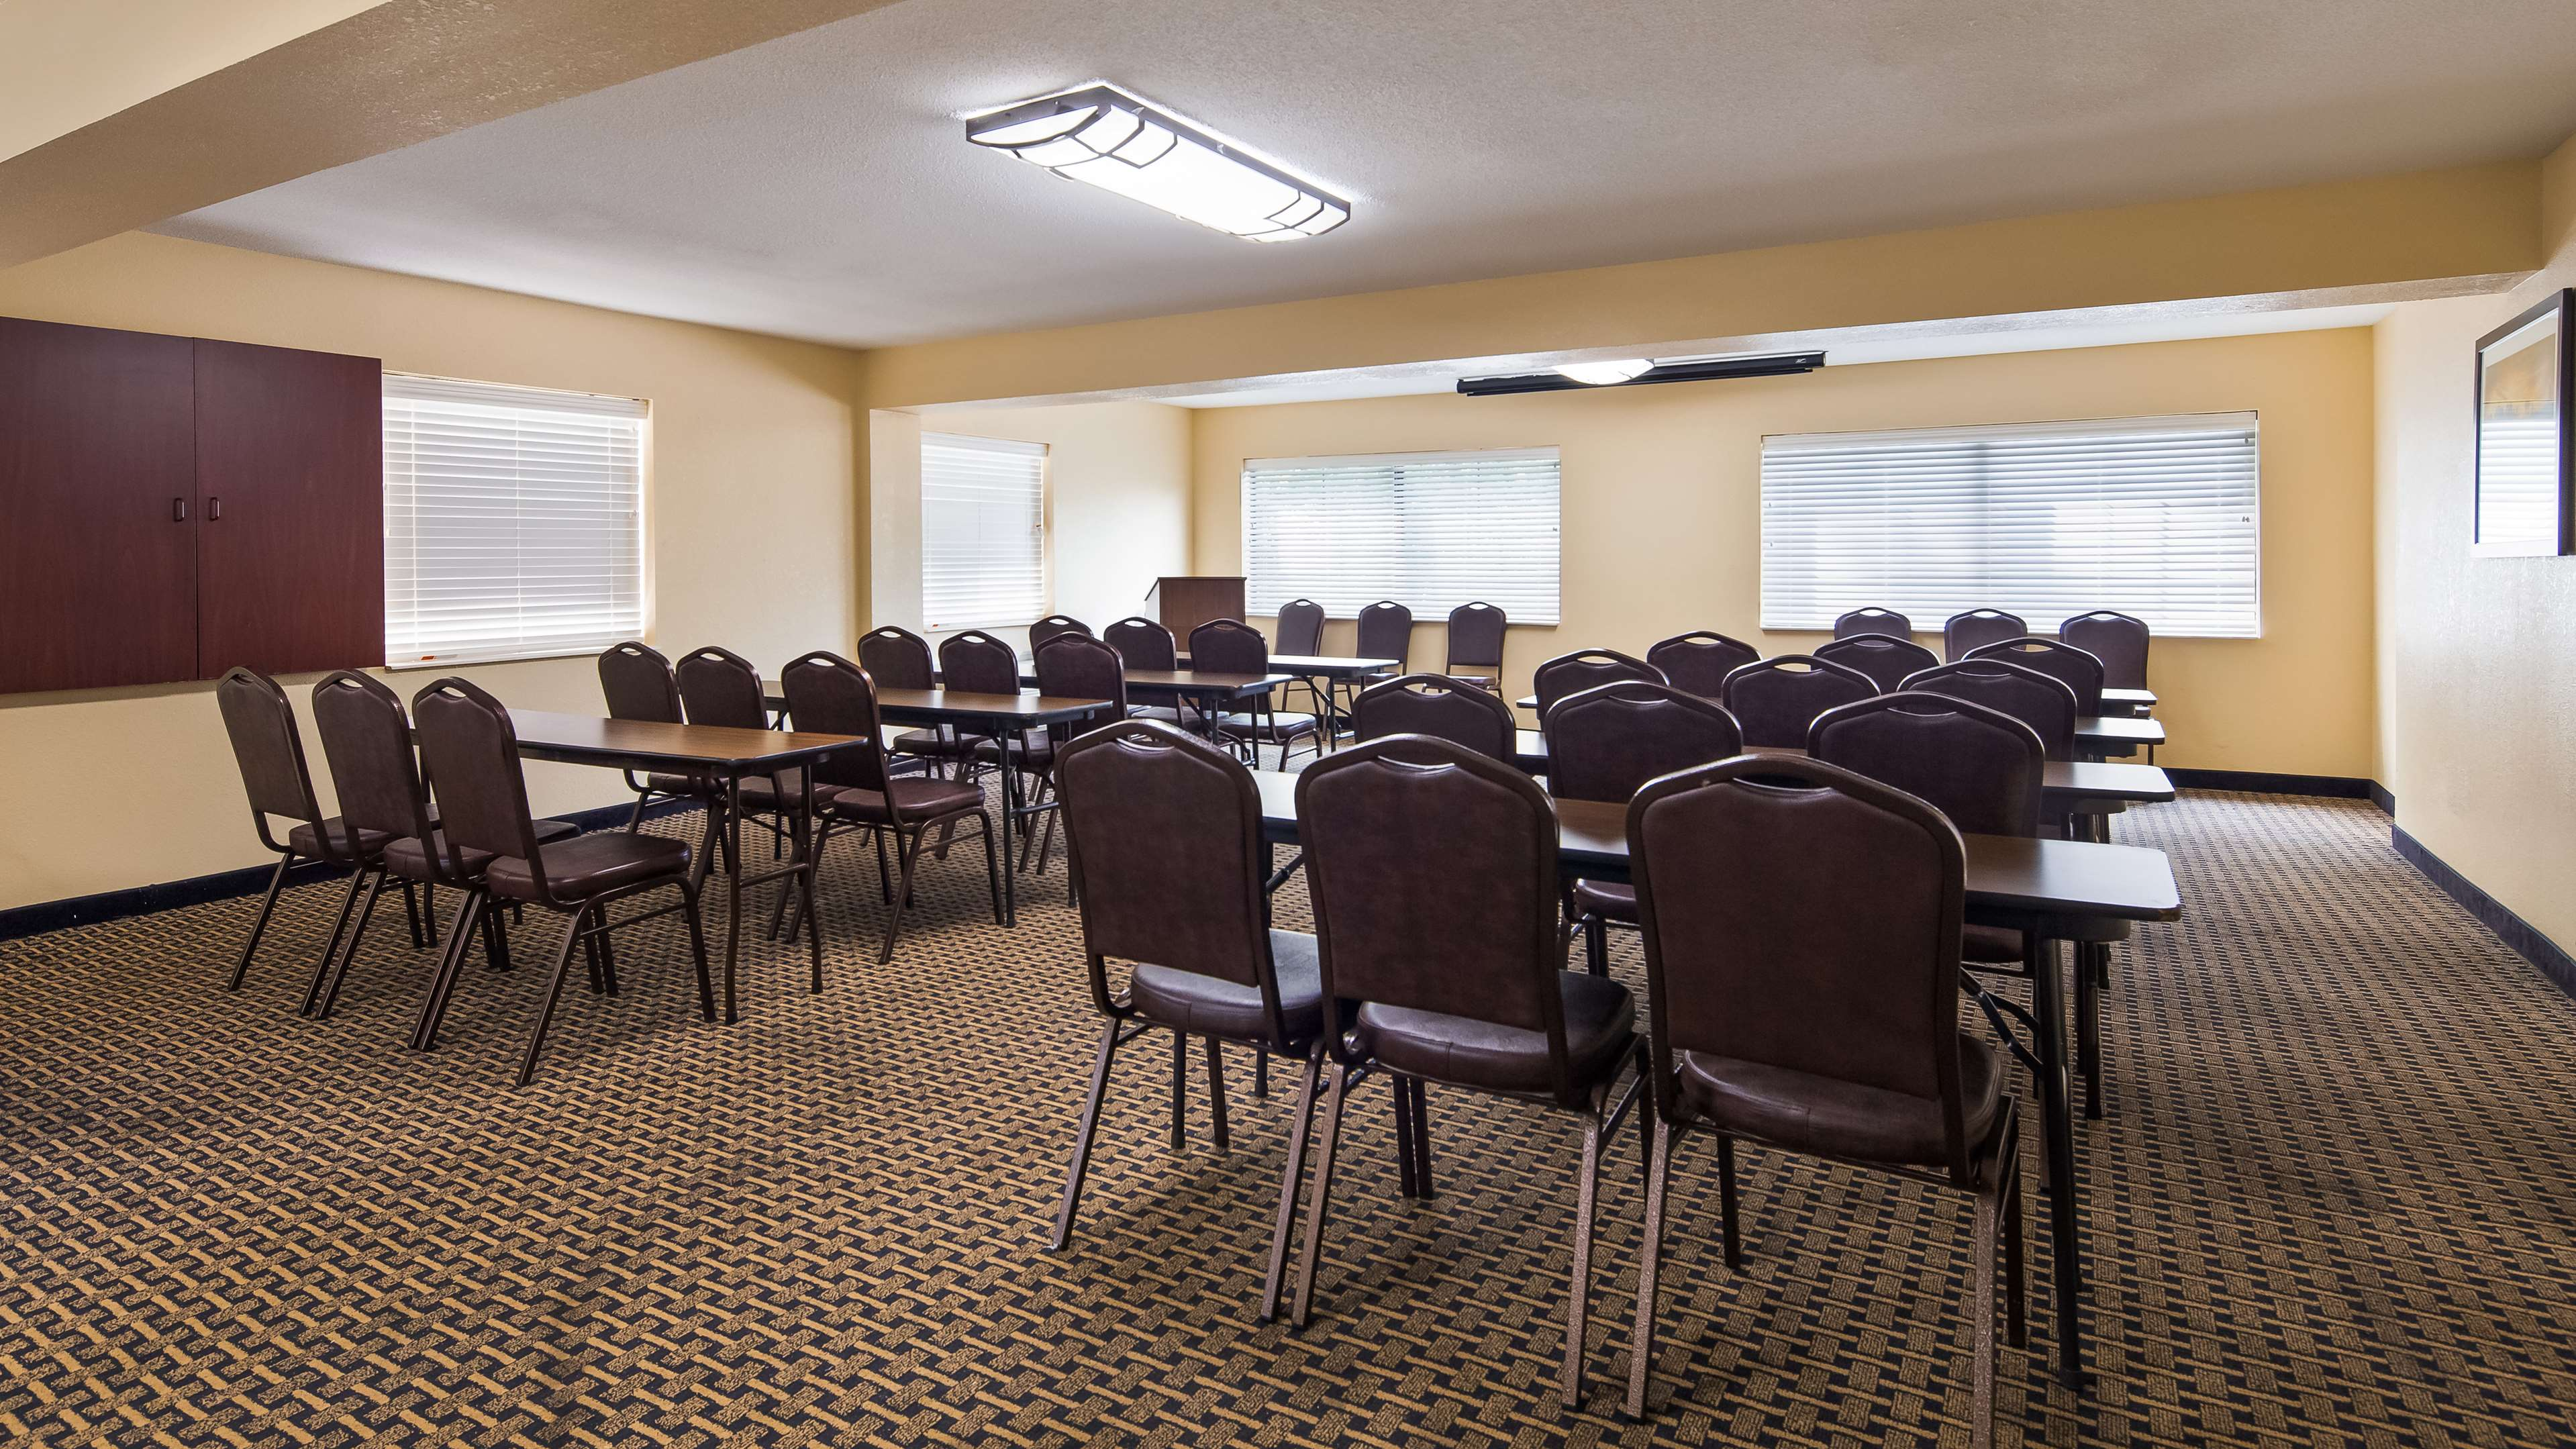 Best Western Executive Suites - Columbus East image 10